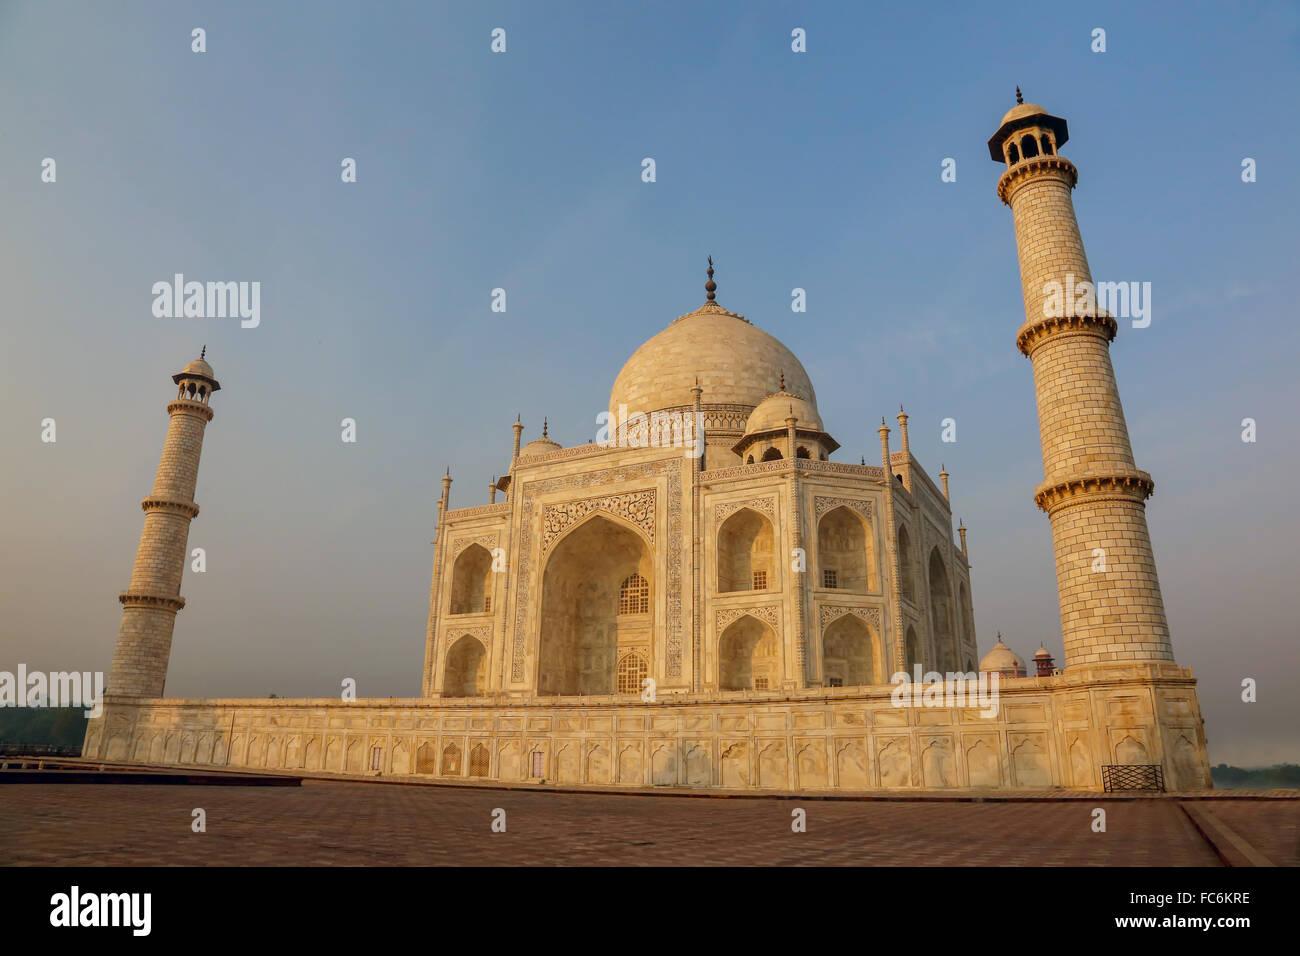 Taj Mahal - Stock Image